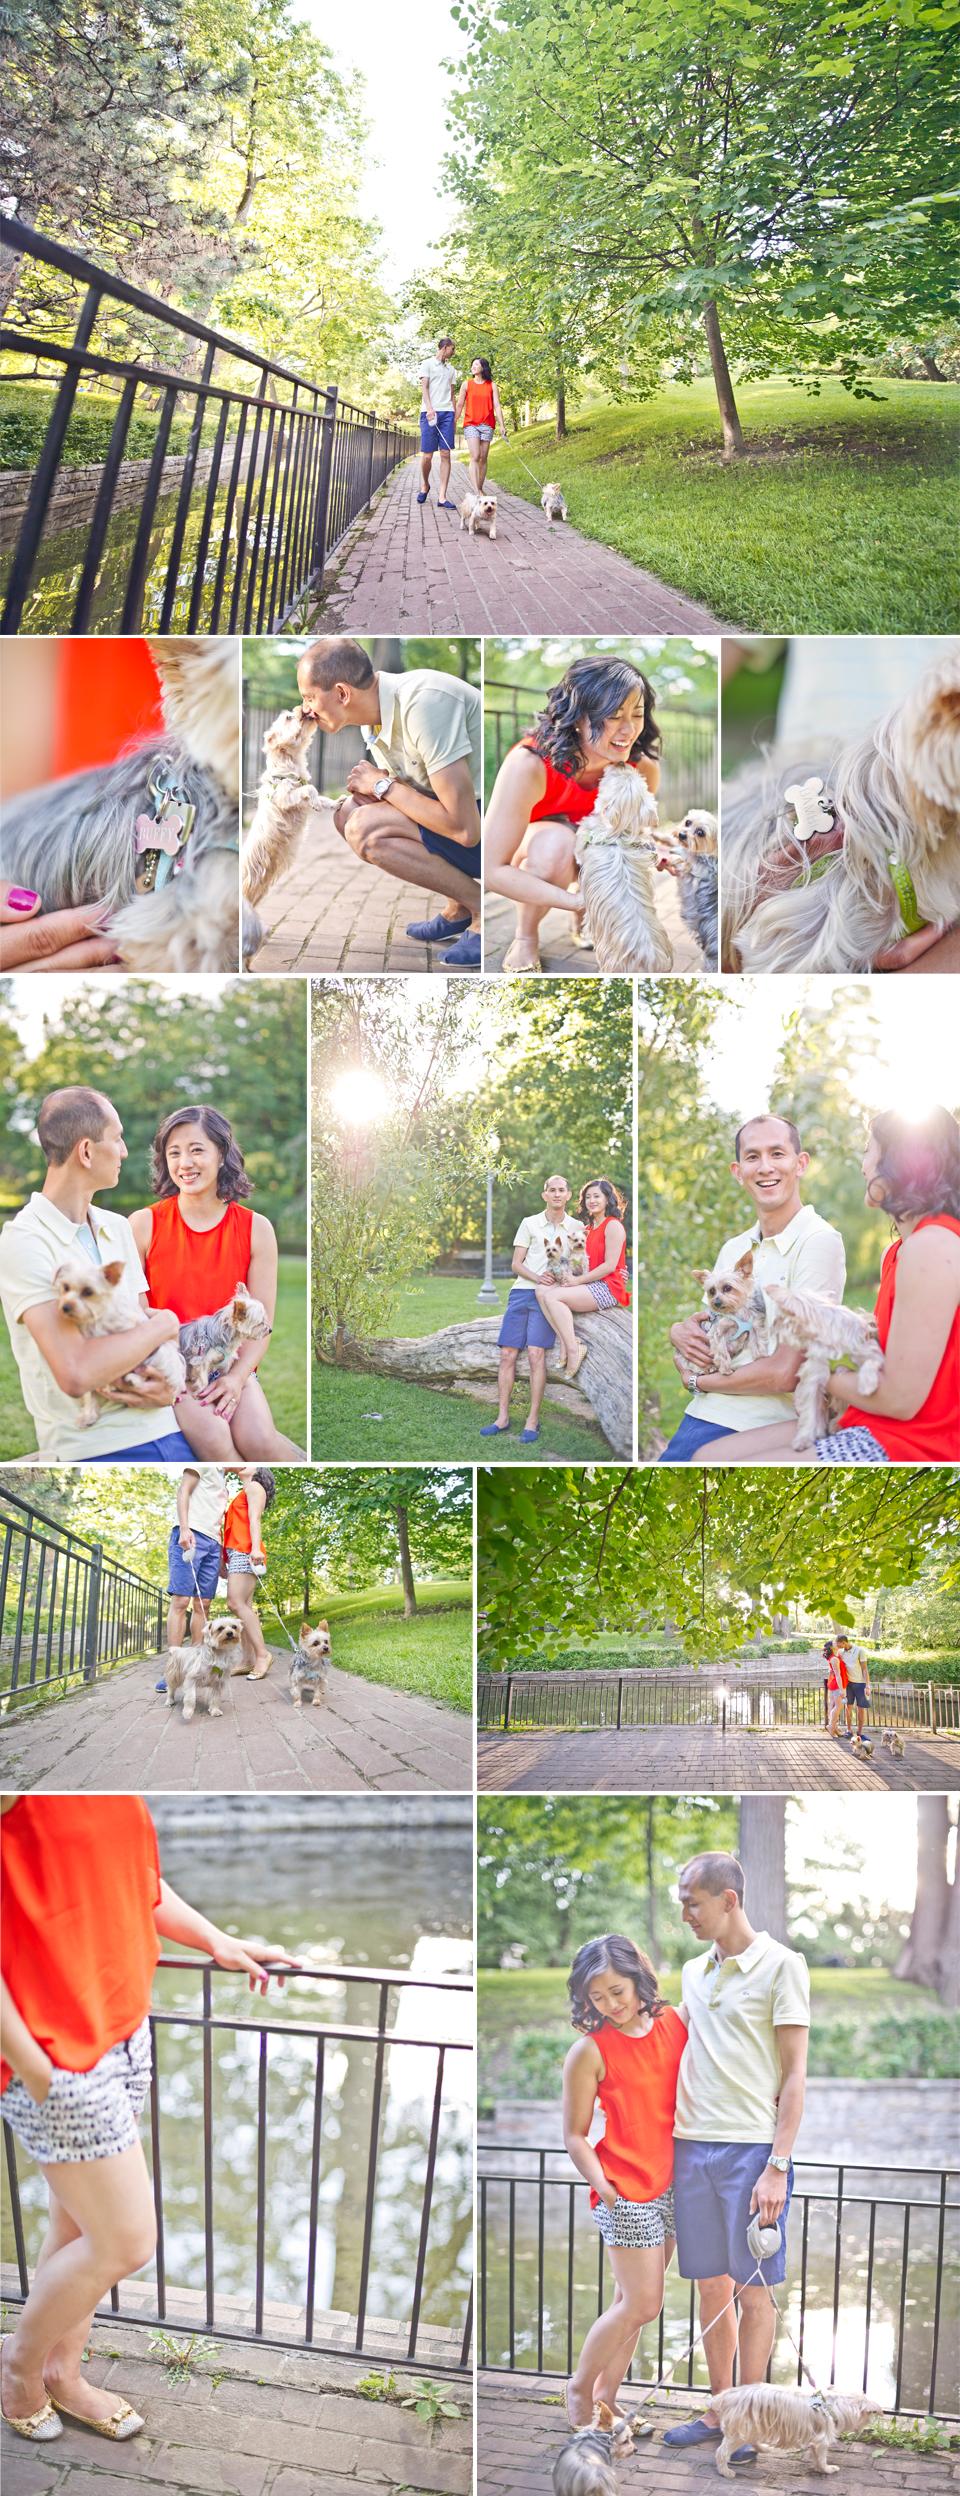 Wedding Photographer Montreal   Westmount Park   Montreal Quebec   LMP Wedding Photography & Videography   Engagement